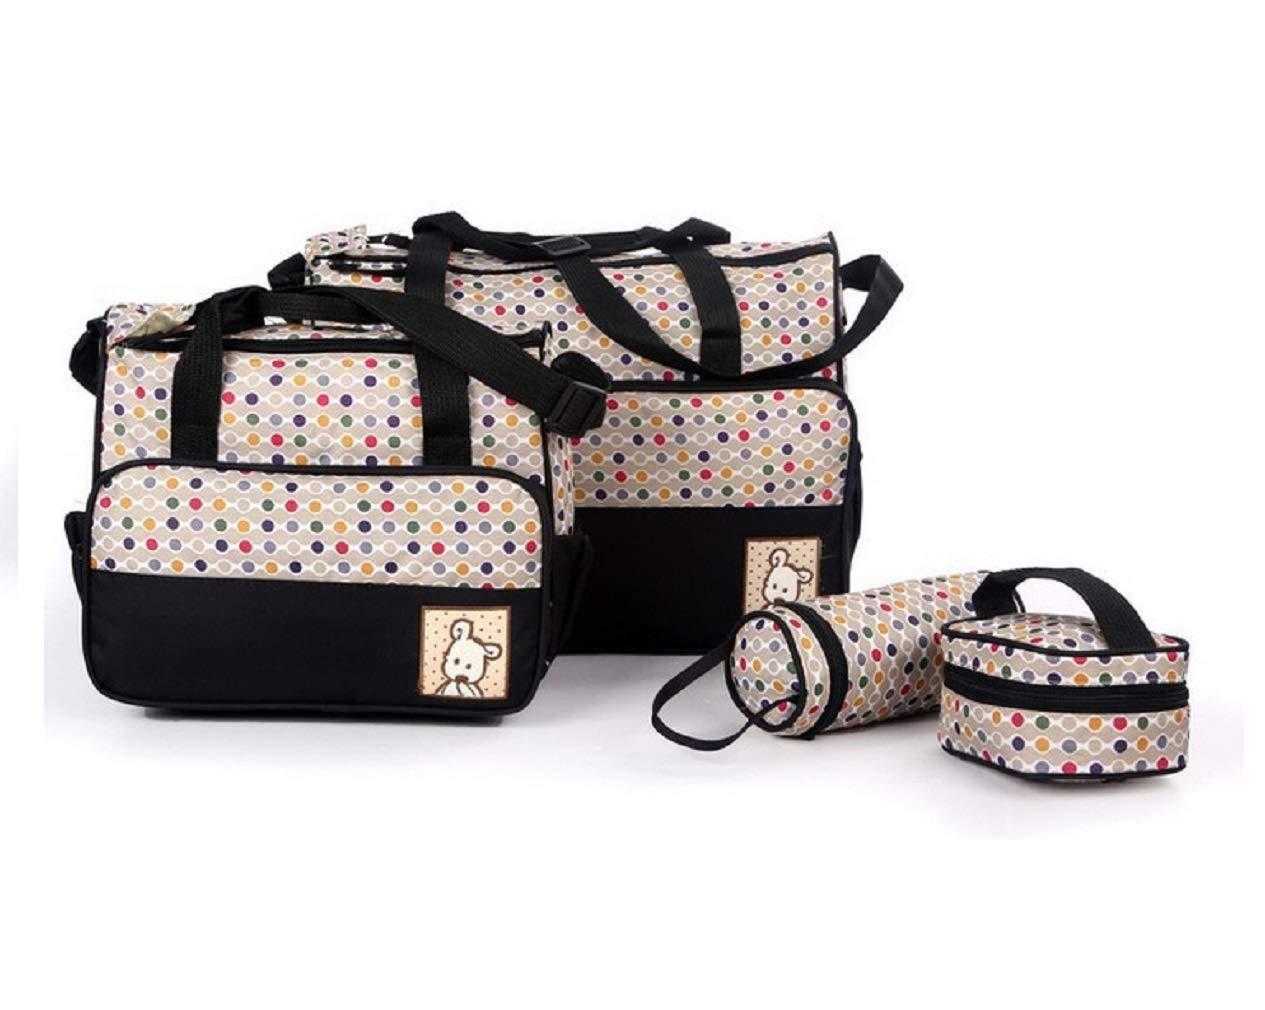 VADOO 5teiliges B/är Baby Wickeltaschen Casual Messenger Bag Umh/ängetasche Schultertasche Mutter-Kind-Tasche Mama Handtasche